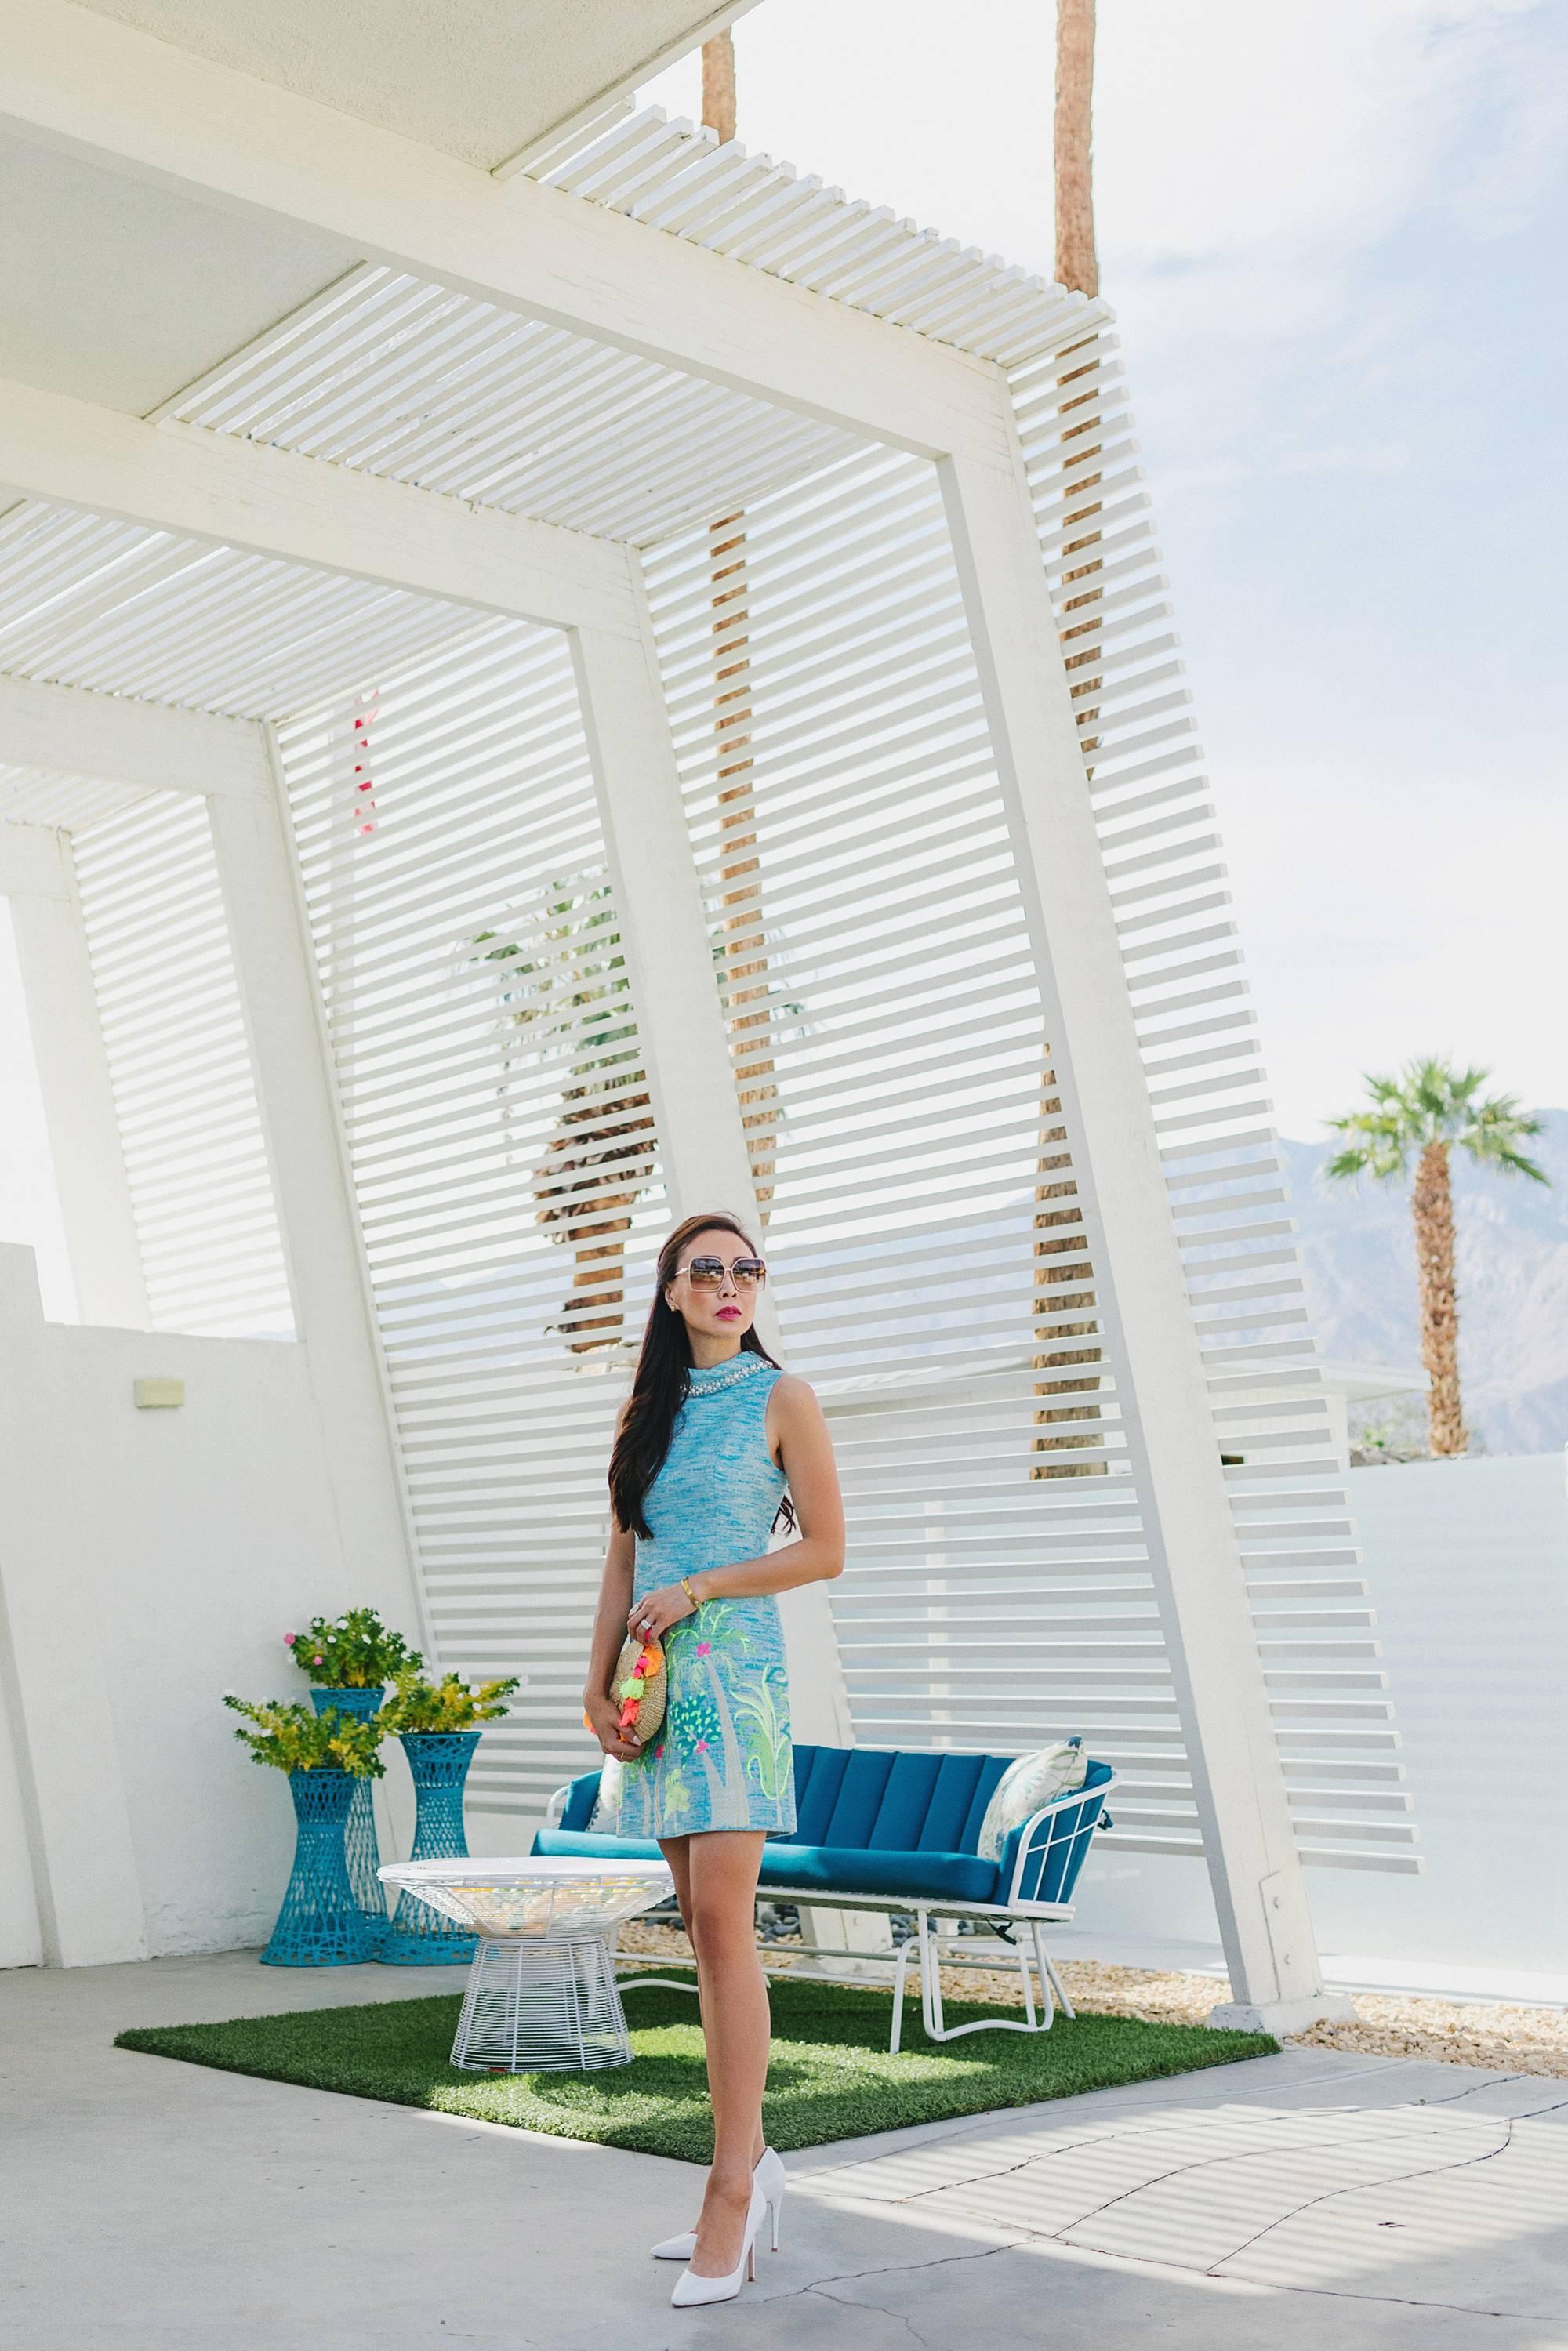 the monkey tree inn Palm Springs wearing Lilly pulitzer on phoenix travel lifestyle blogger Diana Elizabeth wearing blue portia shift dress